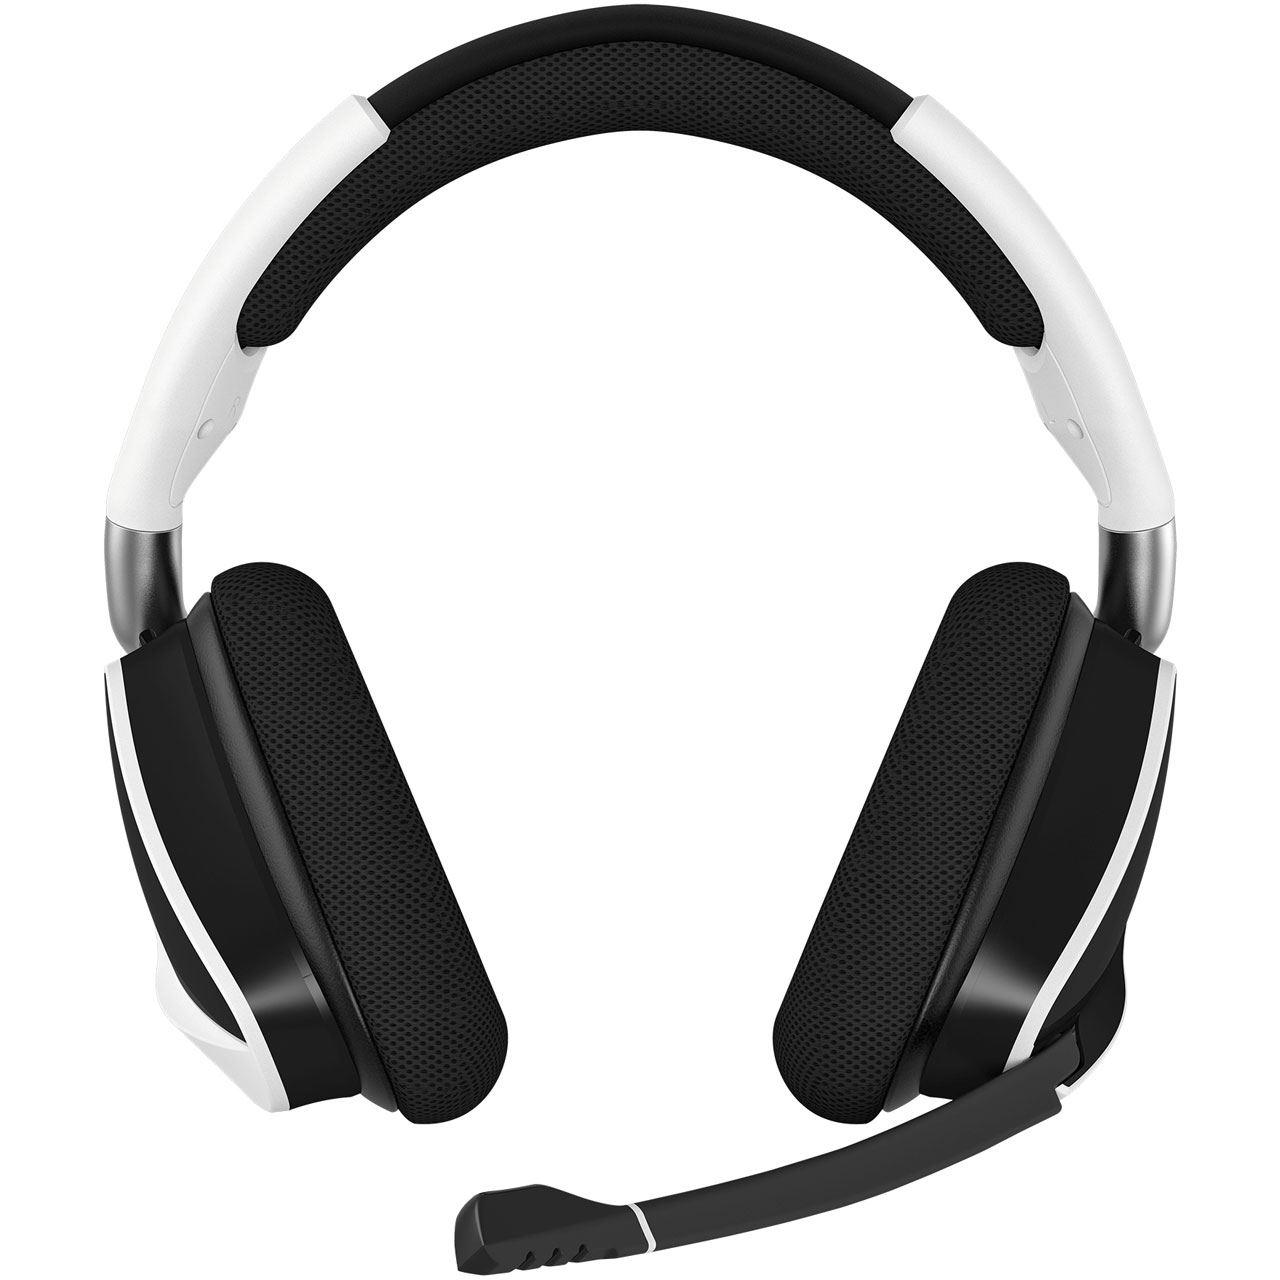 corsair void pro rgb schwarz wei headsets kabellos. Black Bedroom Furniture Sets. Home Design Ideas